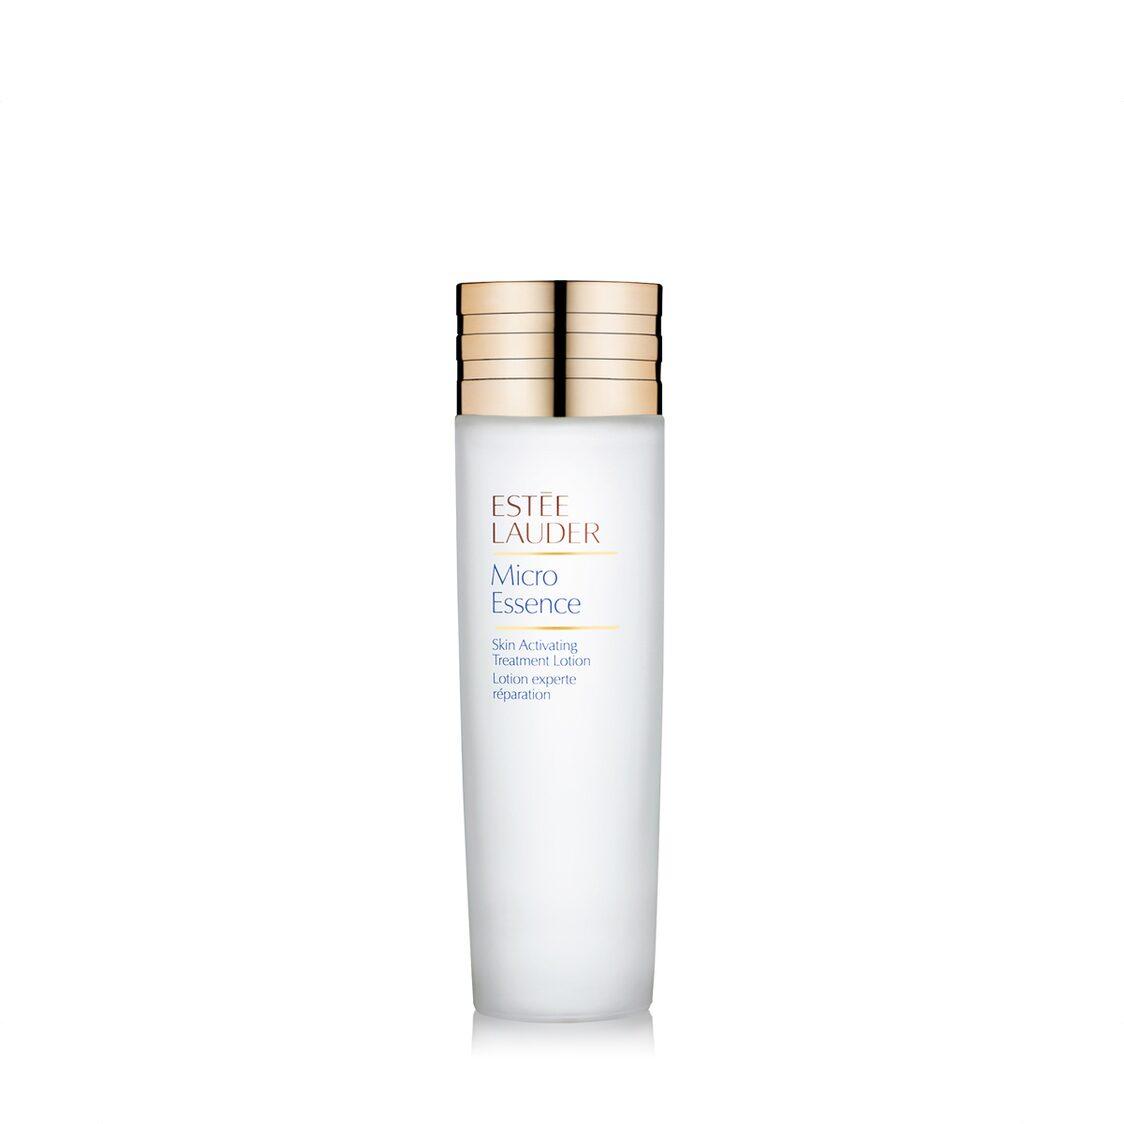 Estee Lauder Micro Essence Skin Activating Treatment Lotion 200ml